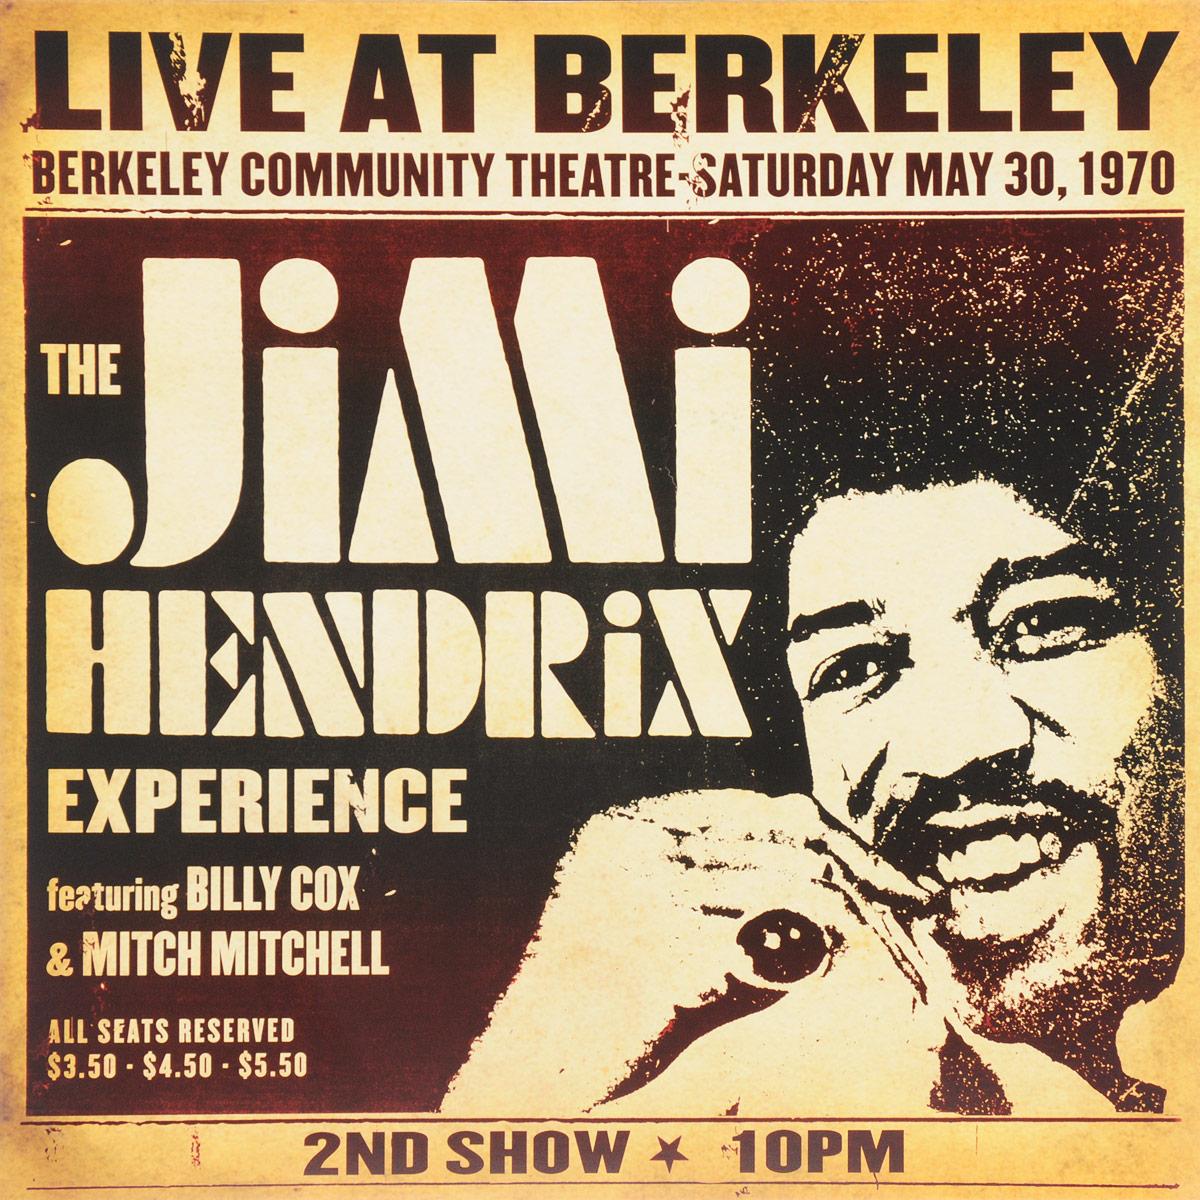 джими хендрикс jimi hendrix experience hendrix the best of jimi hendrix 2 lp Джими Хендрикс Jimi Hendrix. Live At Berkeley (Experience) (2 LP)